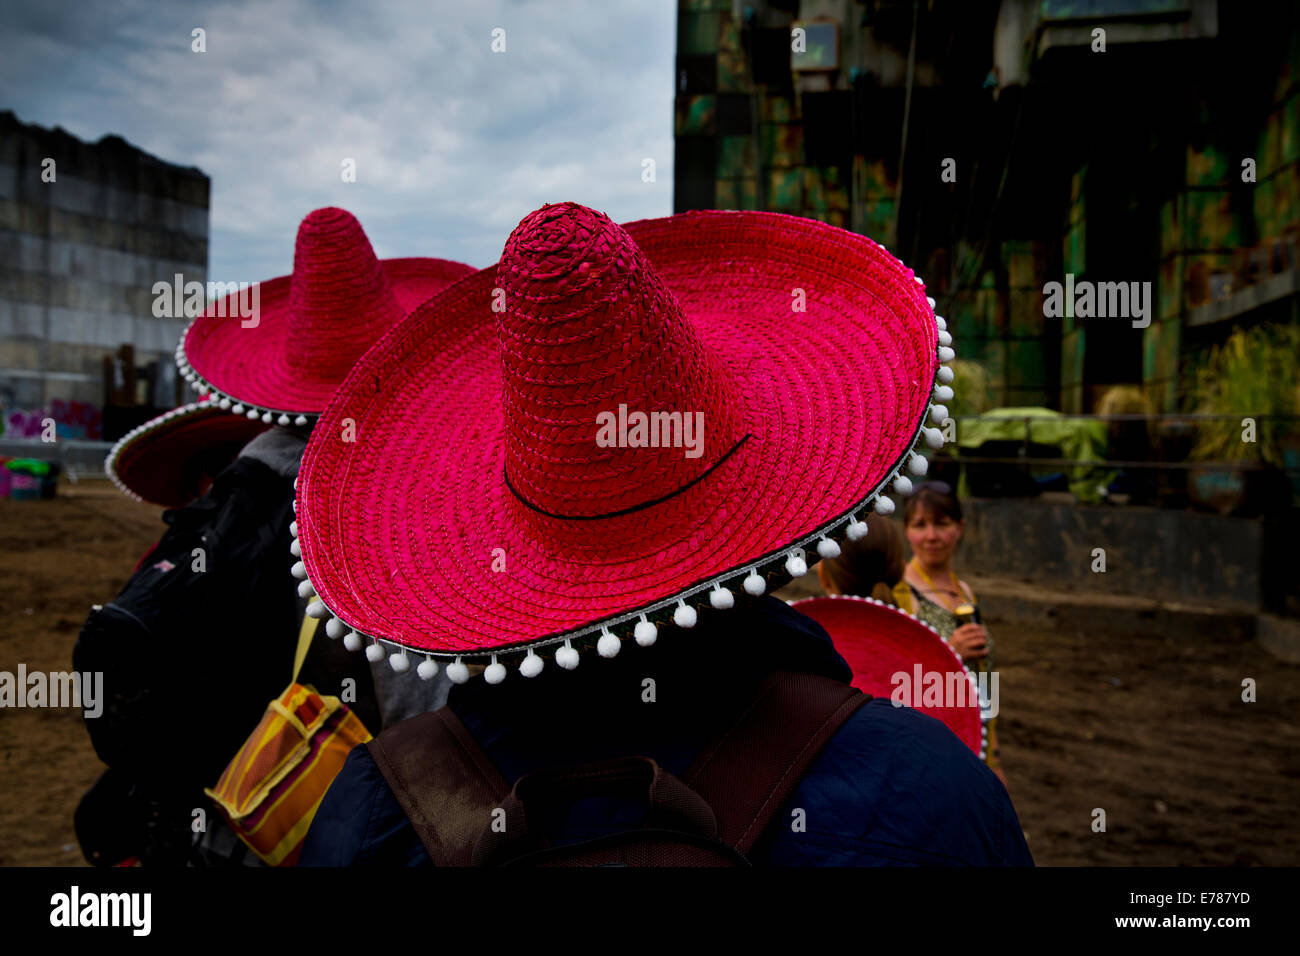 Ravers in Block 9, with sombreros Glastonbury Festival 2014 - Stock Image